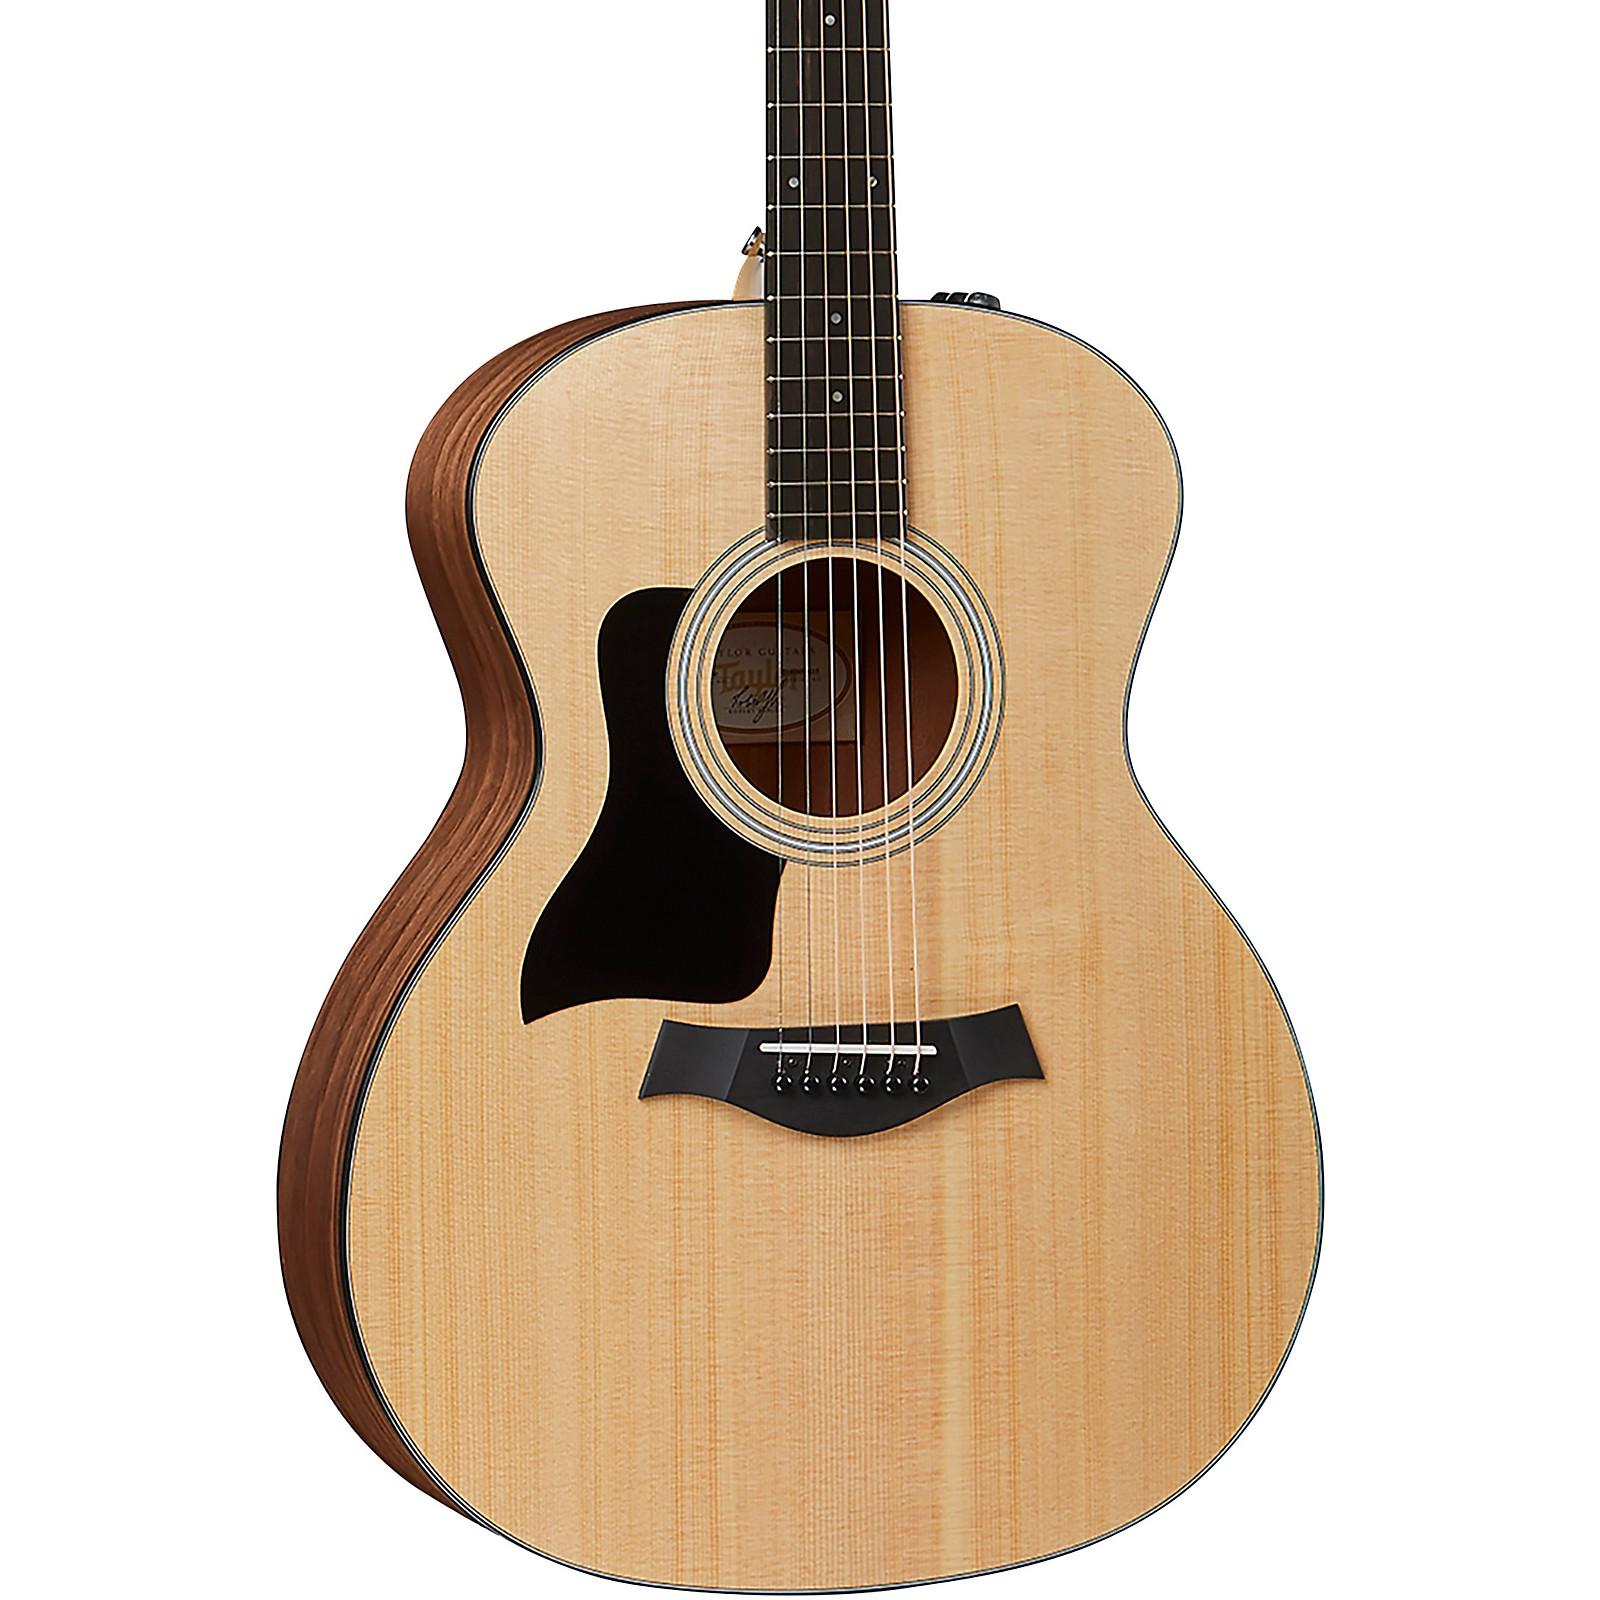 Taylor 114e-LH Left-Handed Grand Auditorium Acoustic-Electric Guitar Regular